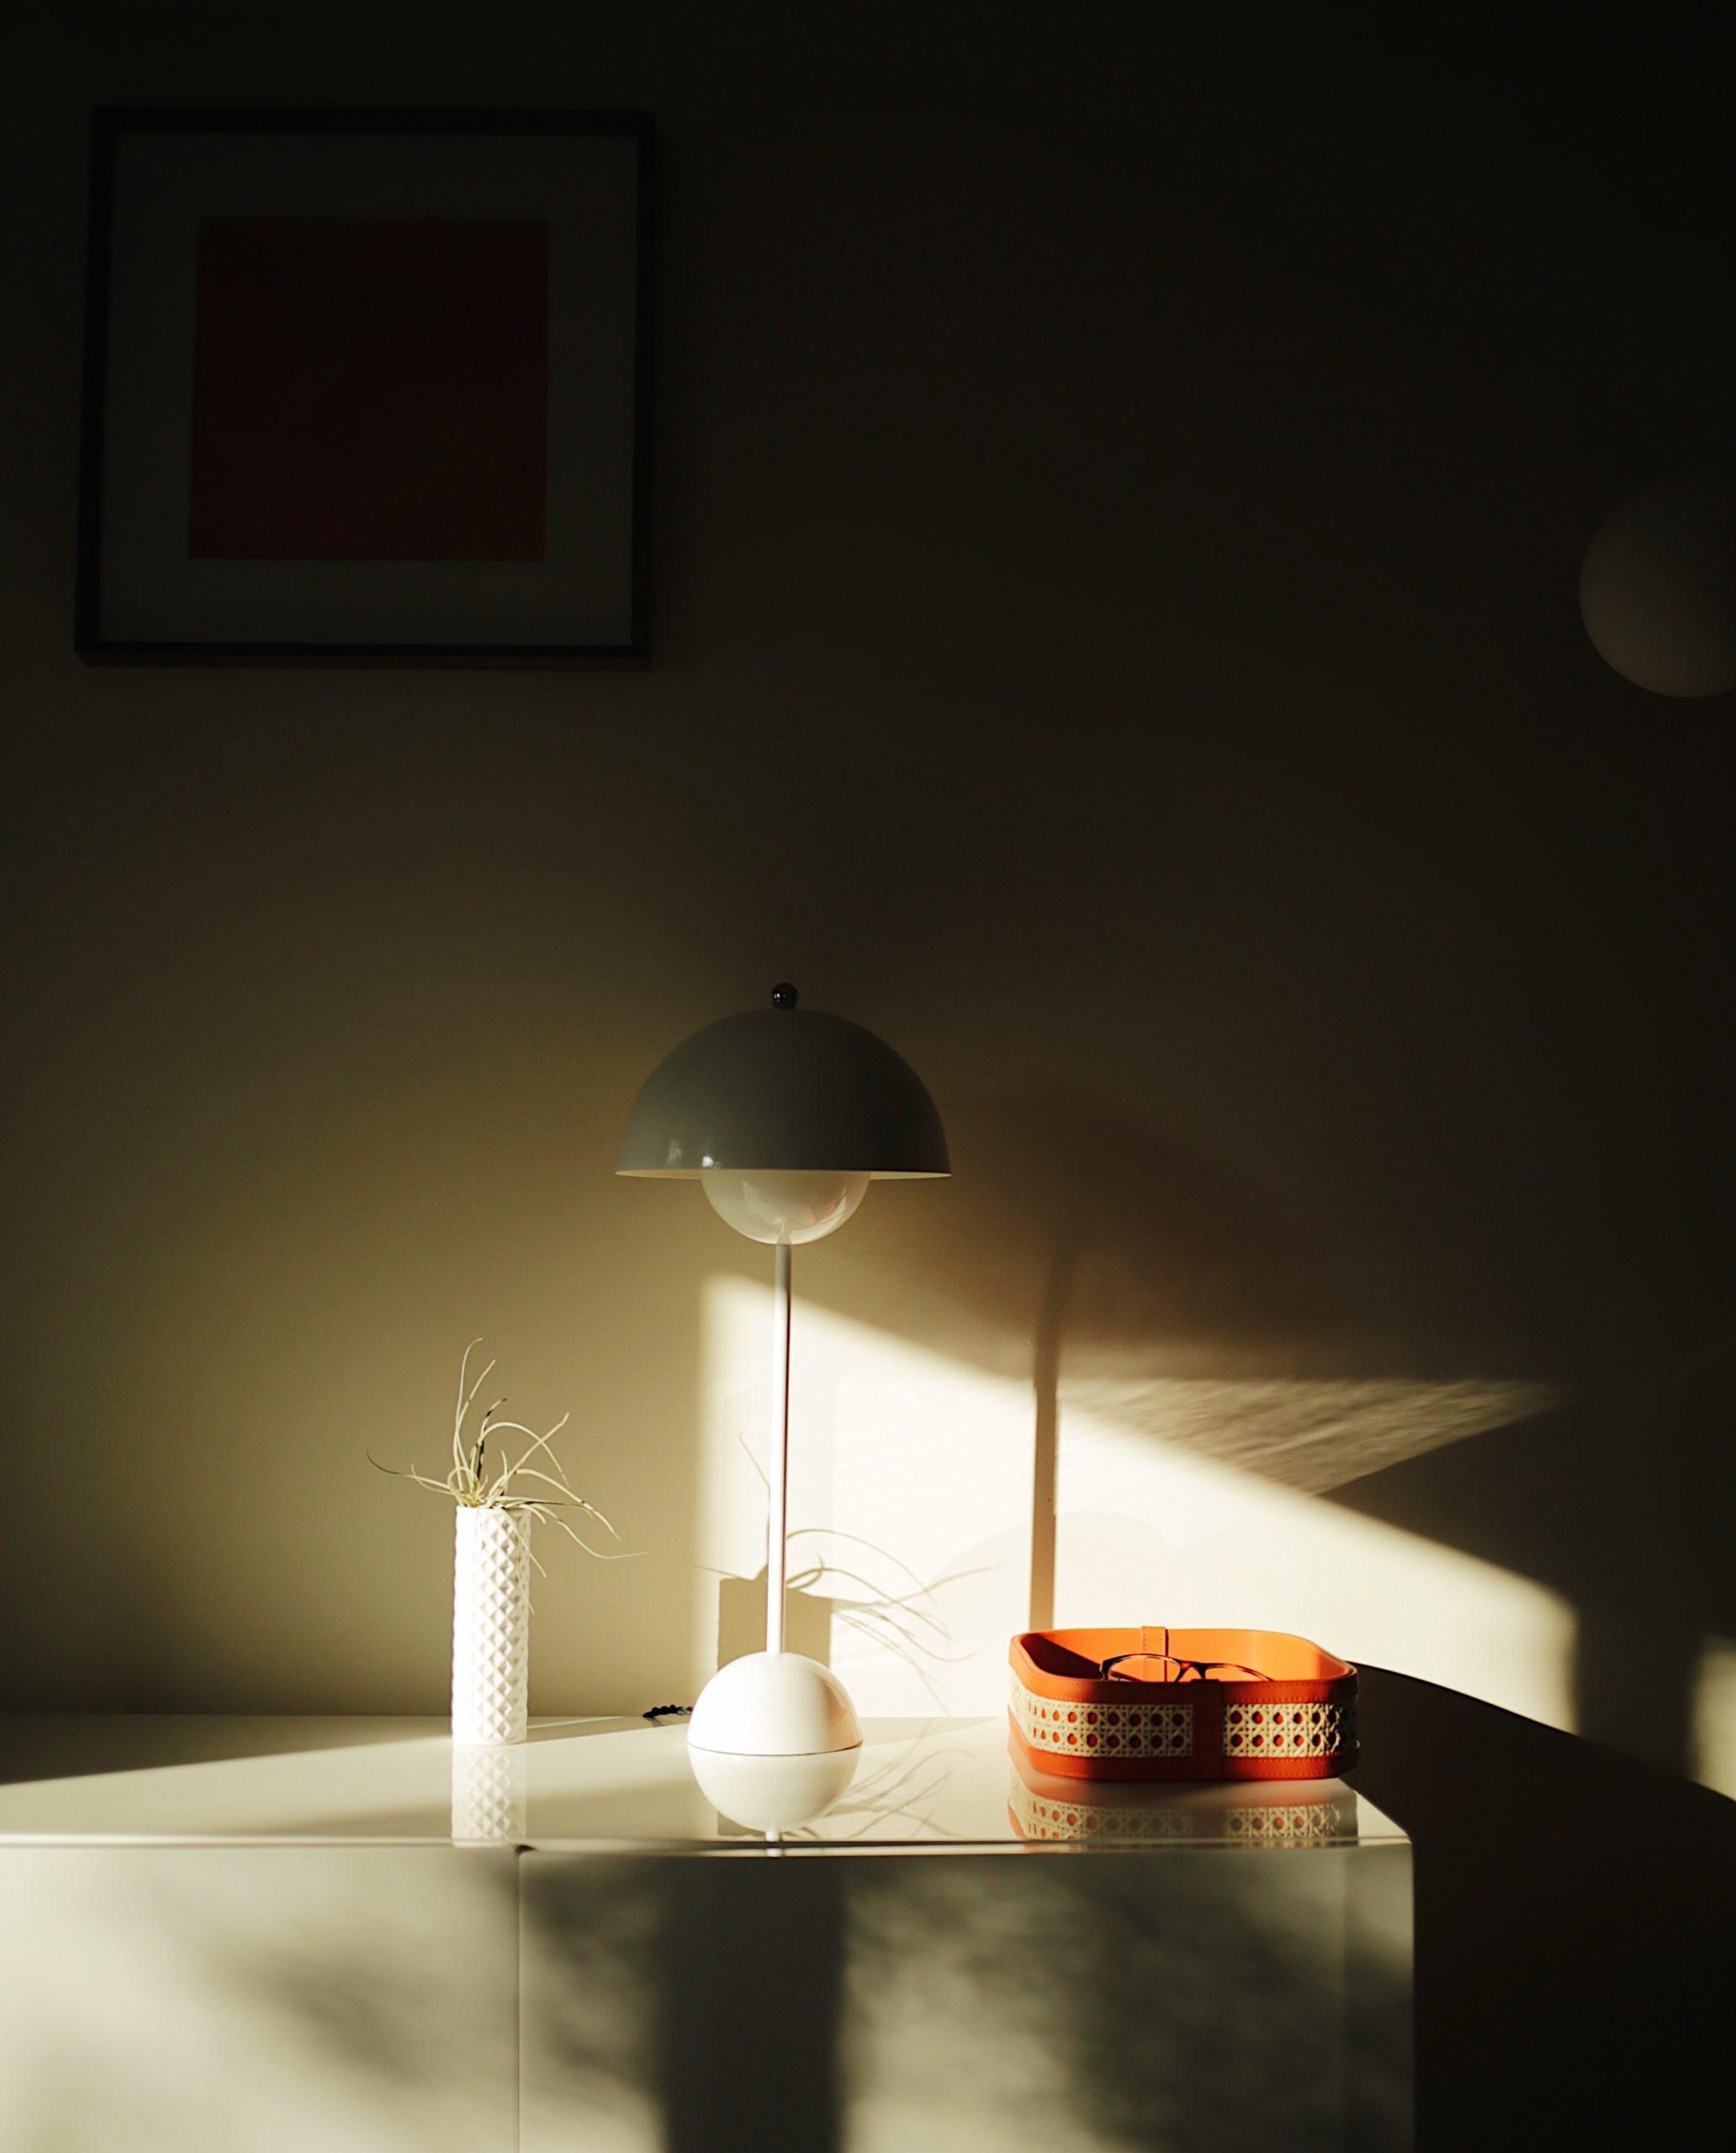 france & son flowerpot replica verner panton table lamp modern table lamp minimal table lamp mid-century table lamp